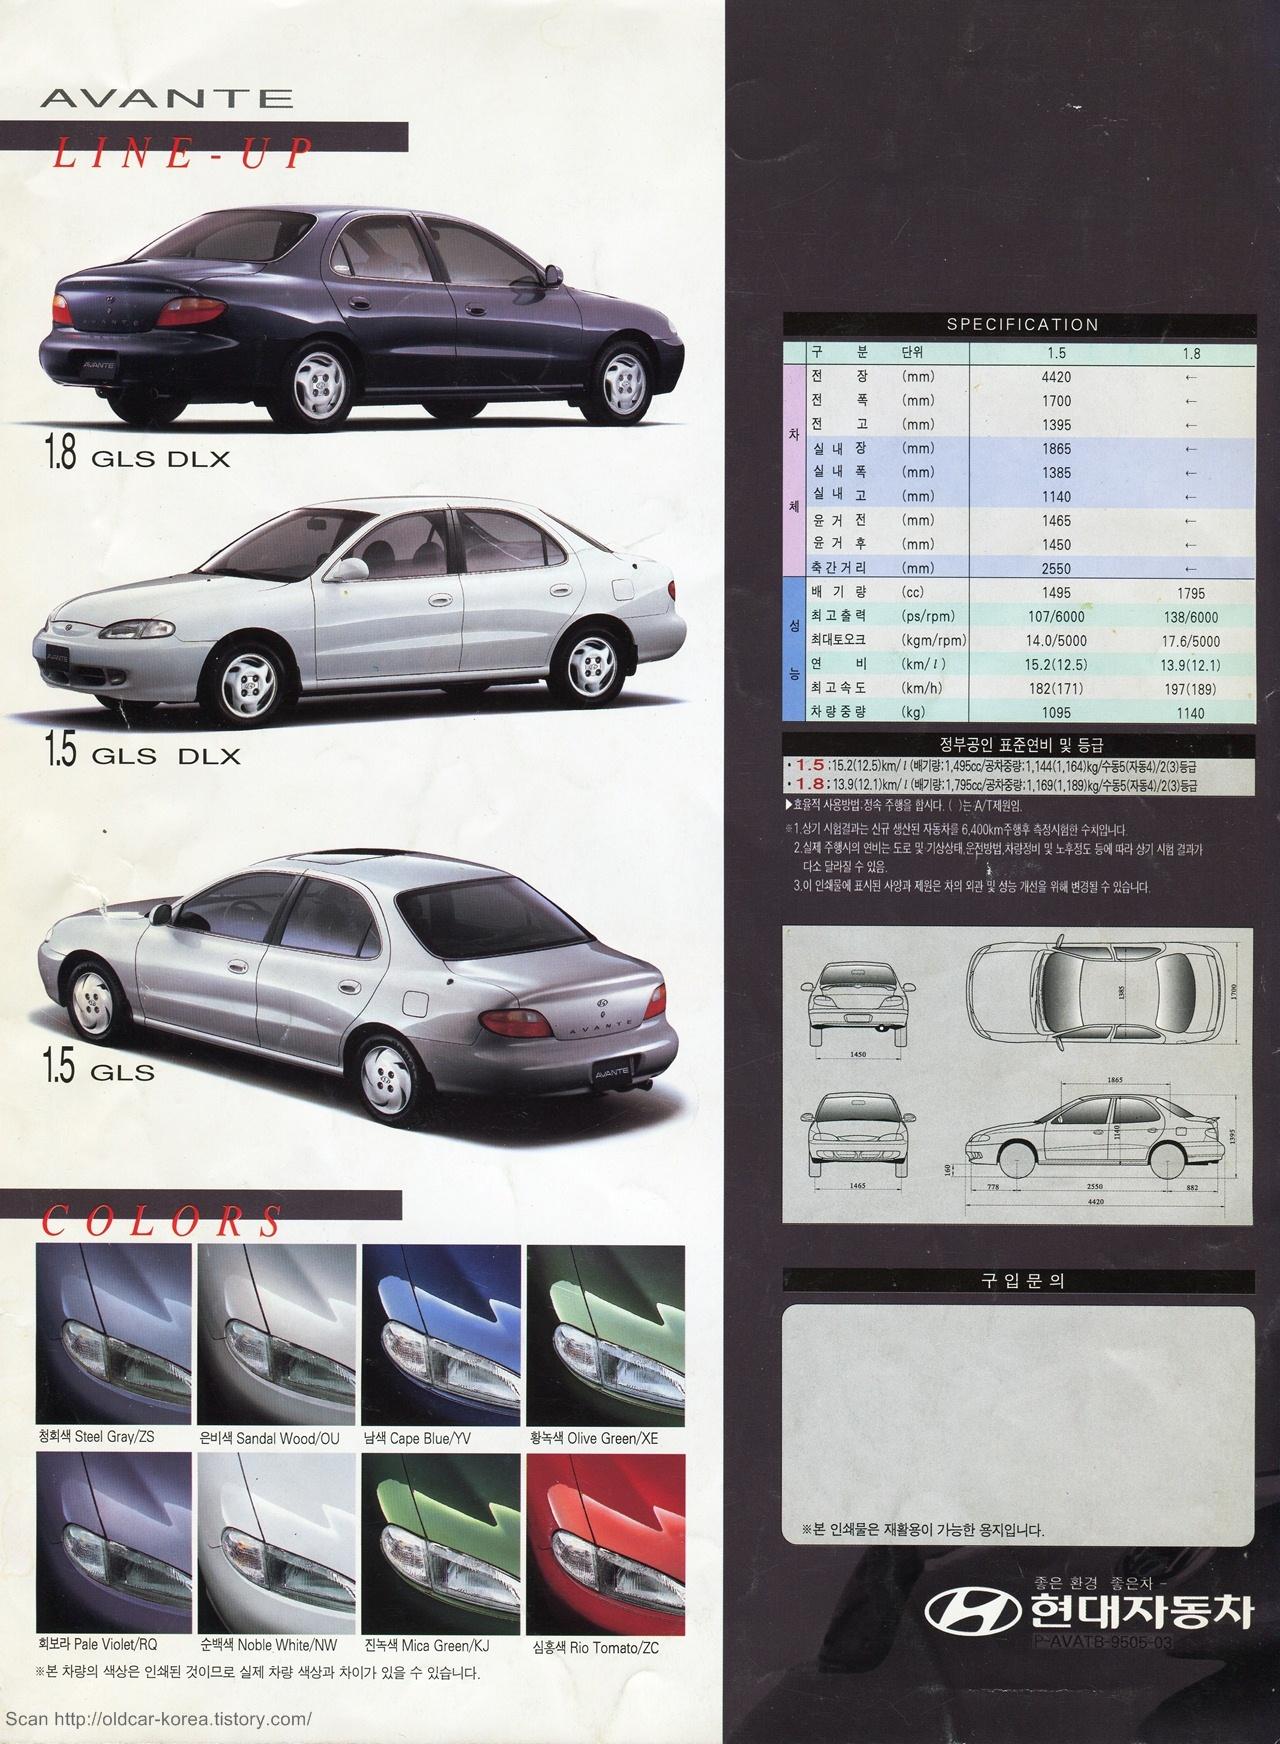 F D Fd E Cf on 1995 Hyundai Elantra